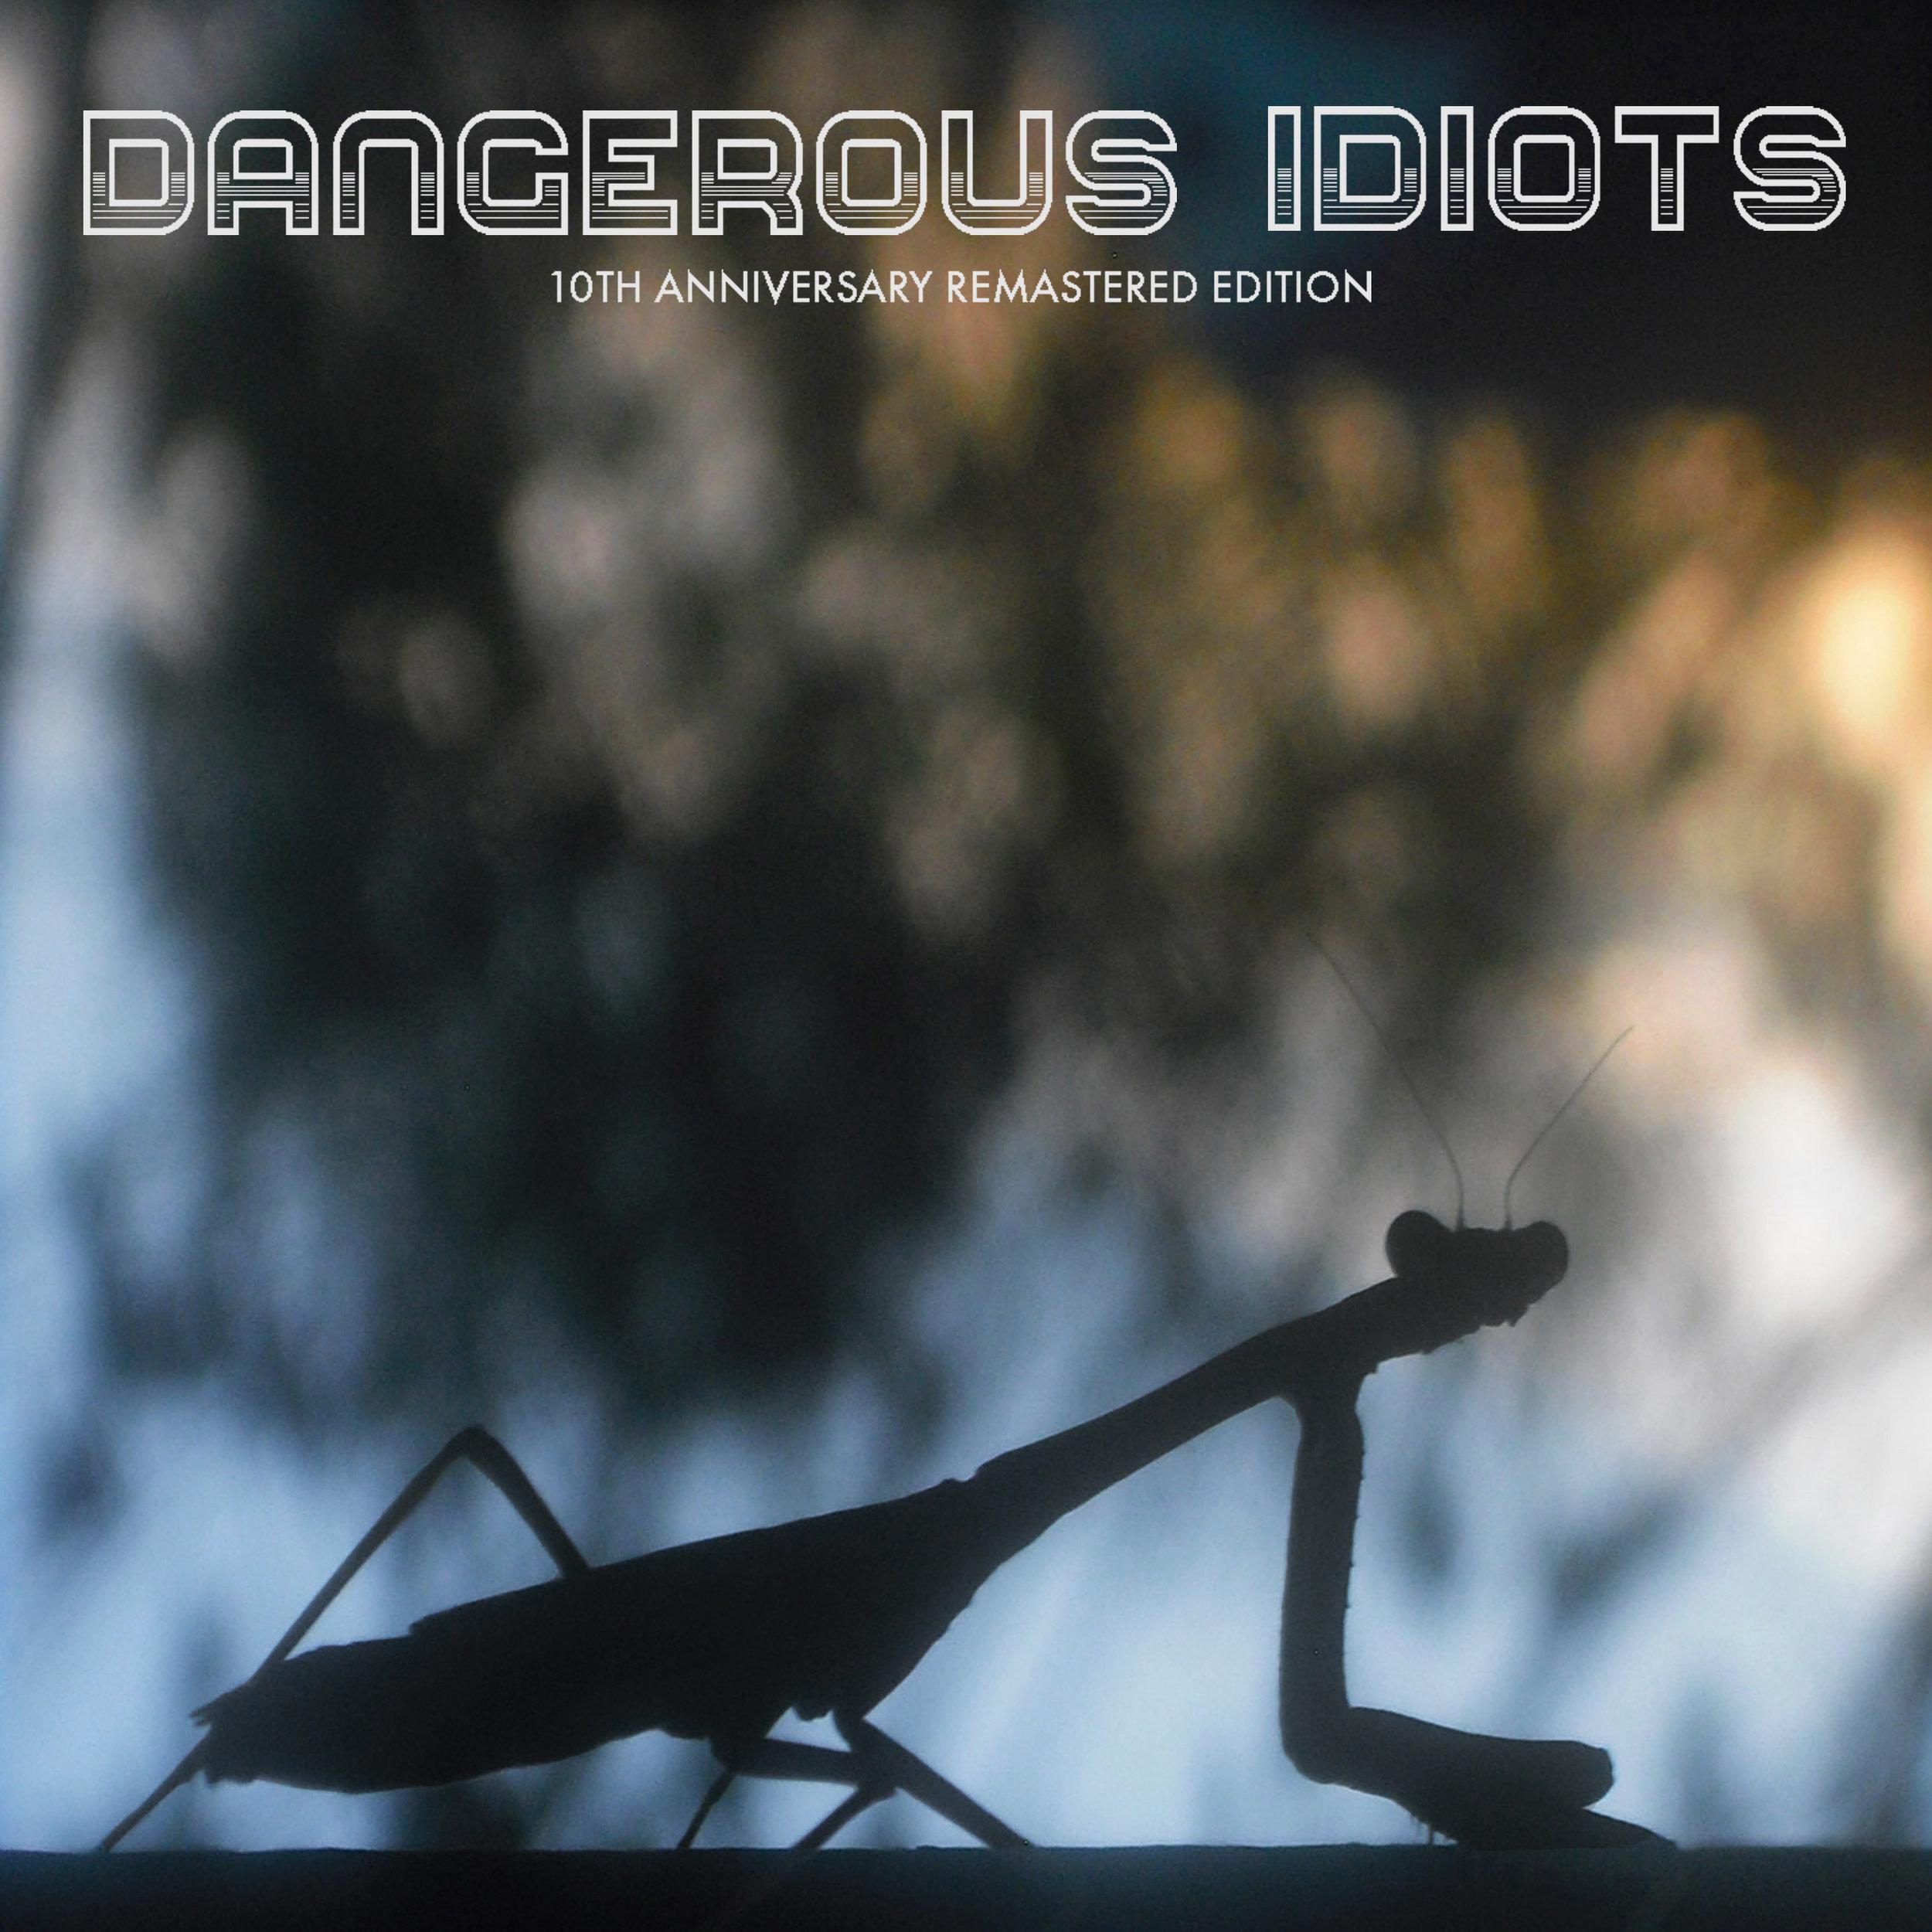 DANGEROUSIDIOTS10thAnniversary-FrontCover-NoBorder.jpg